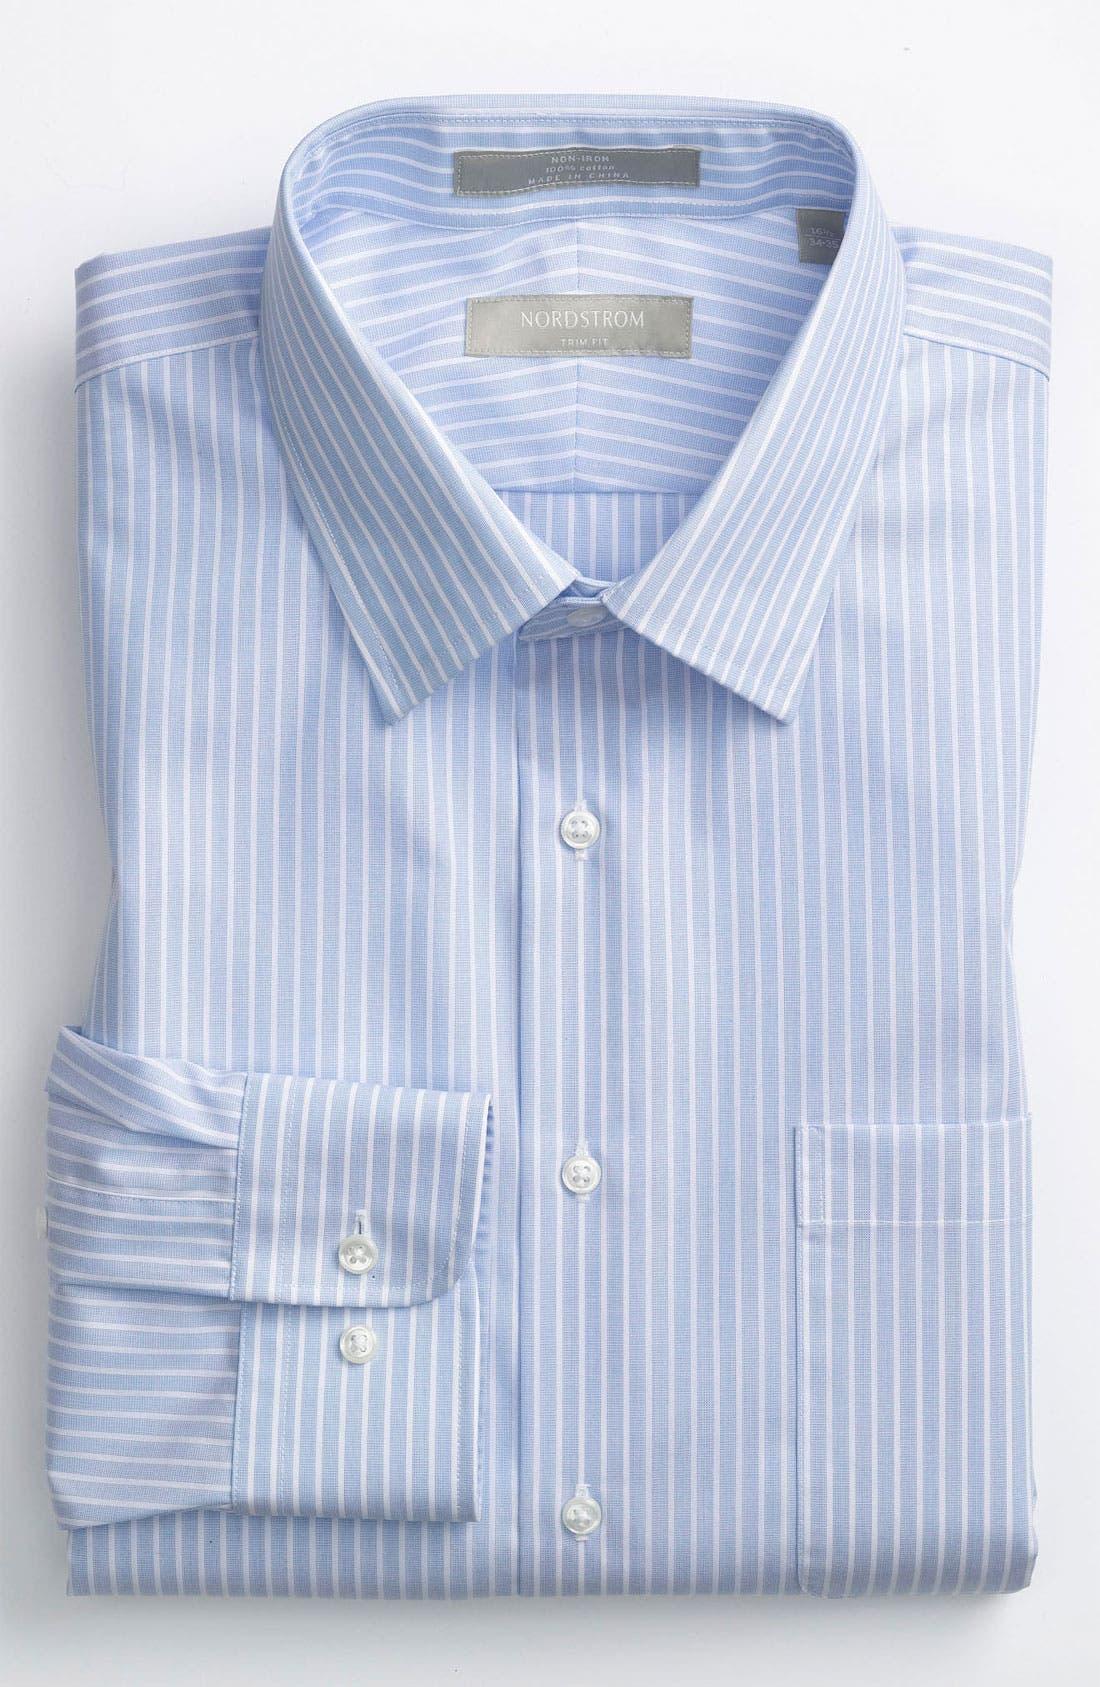 Main Image - Nordstrom Trim Fit Non-Iron Dress Shirt (Online Exclusive)